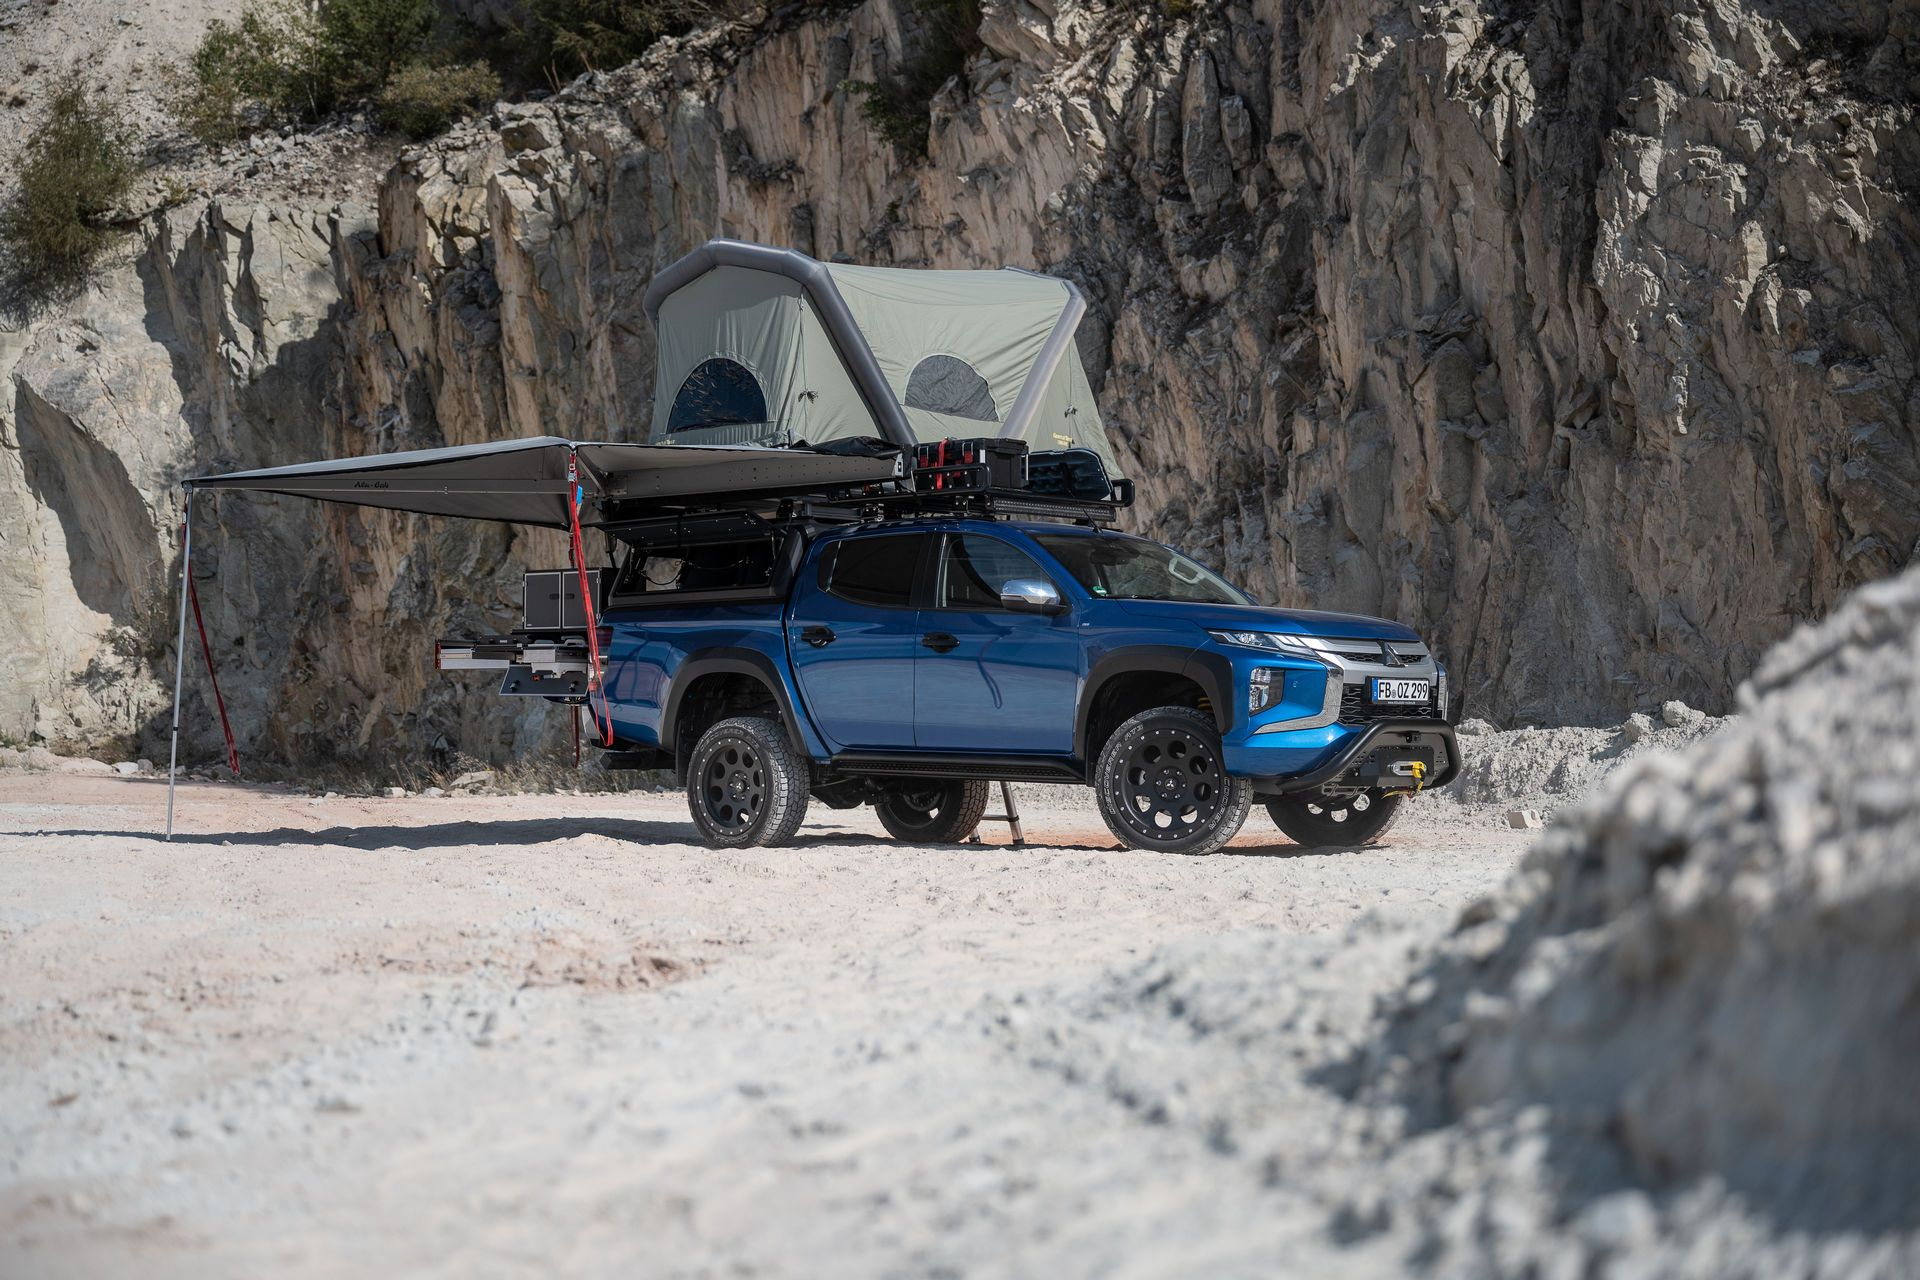 Mitsubishi-L200-Camping-Accessories-5